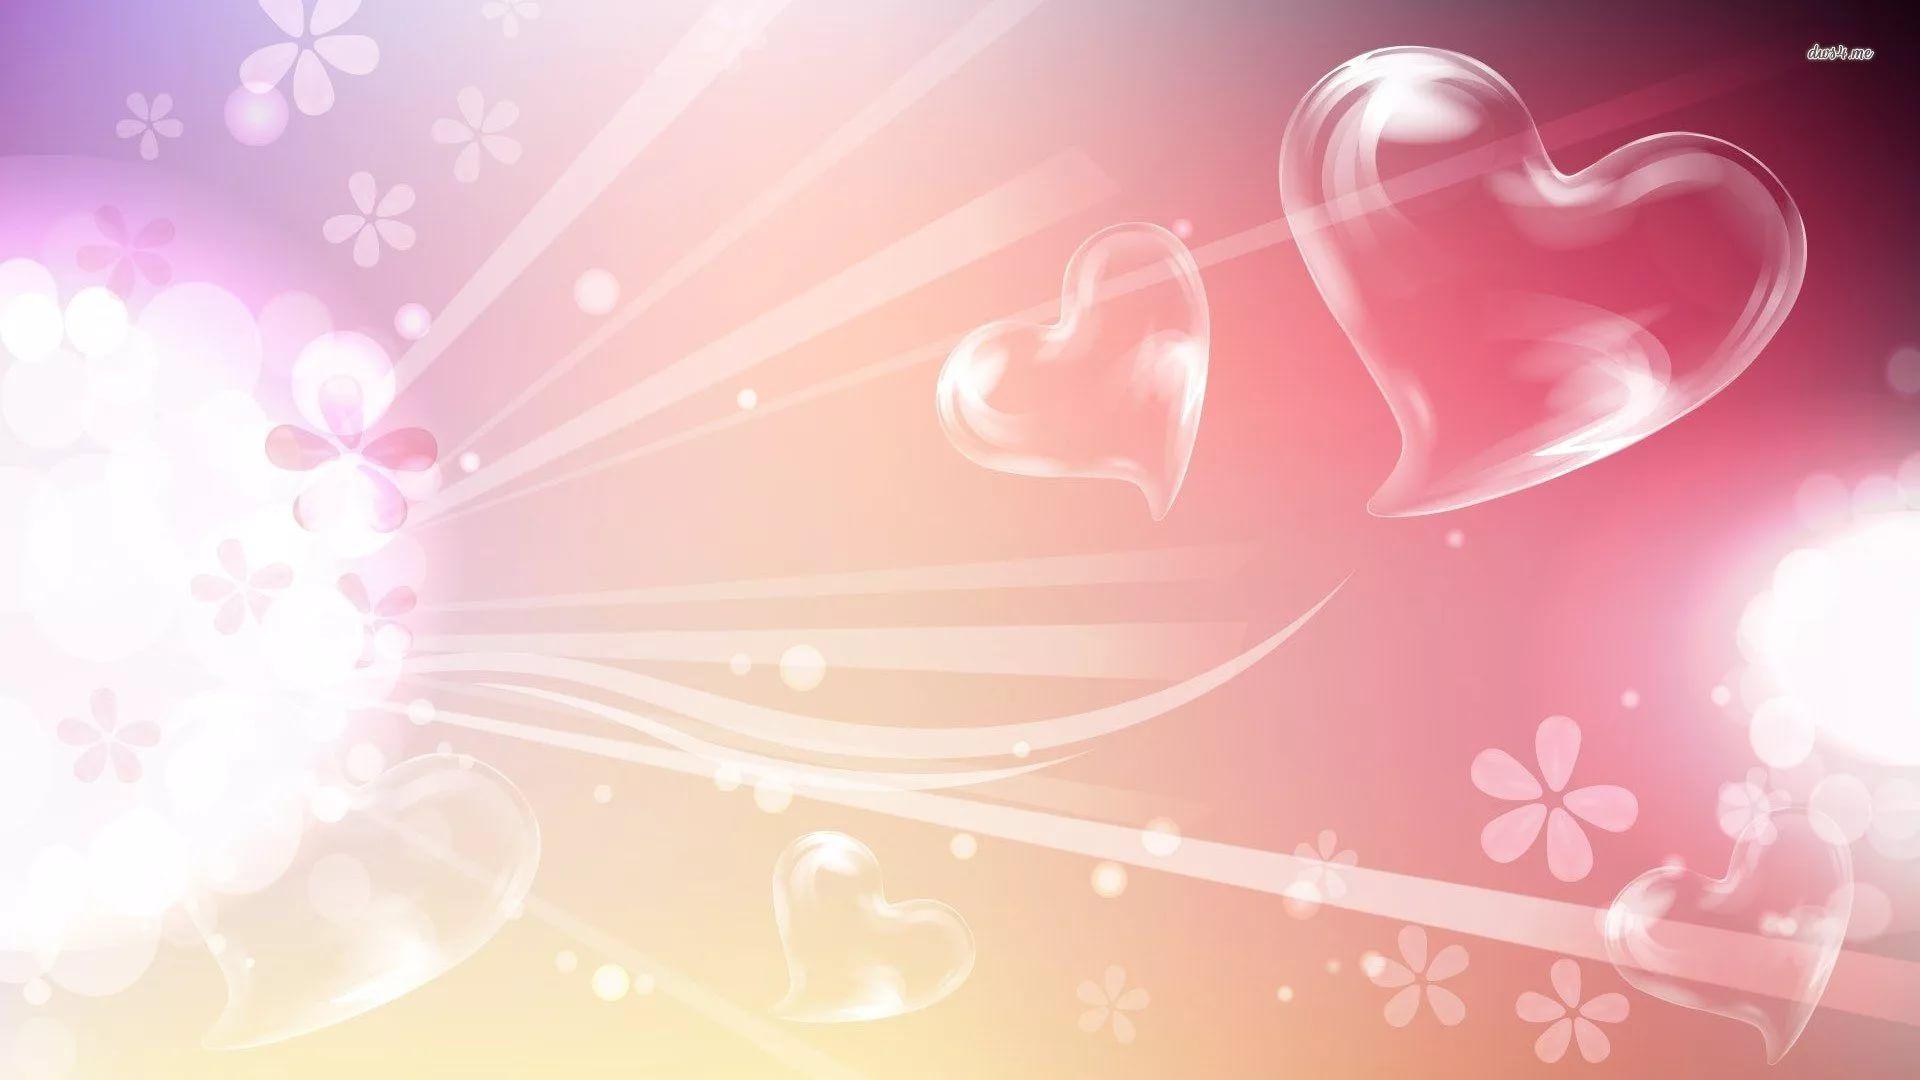 Valentine Screensaver full screen hd wallpaper